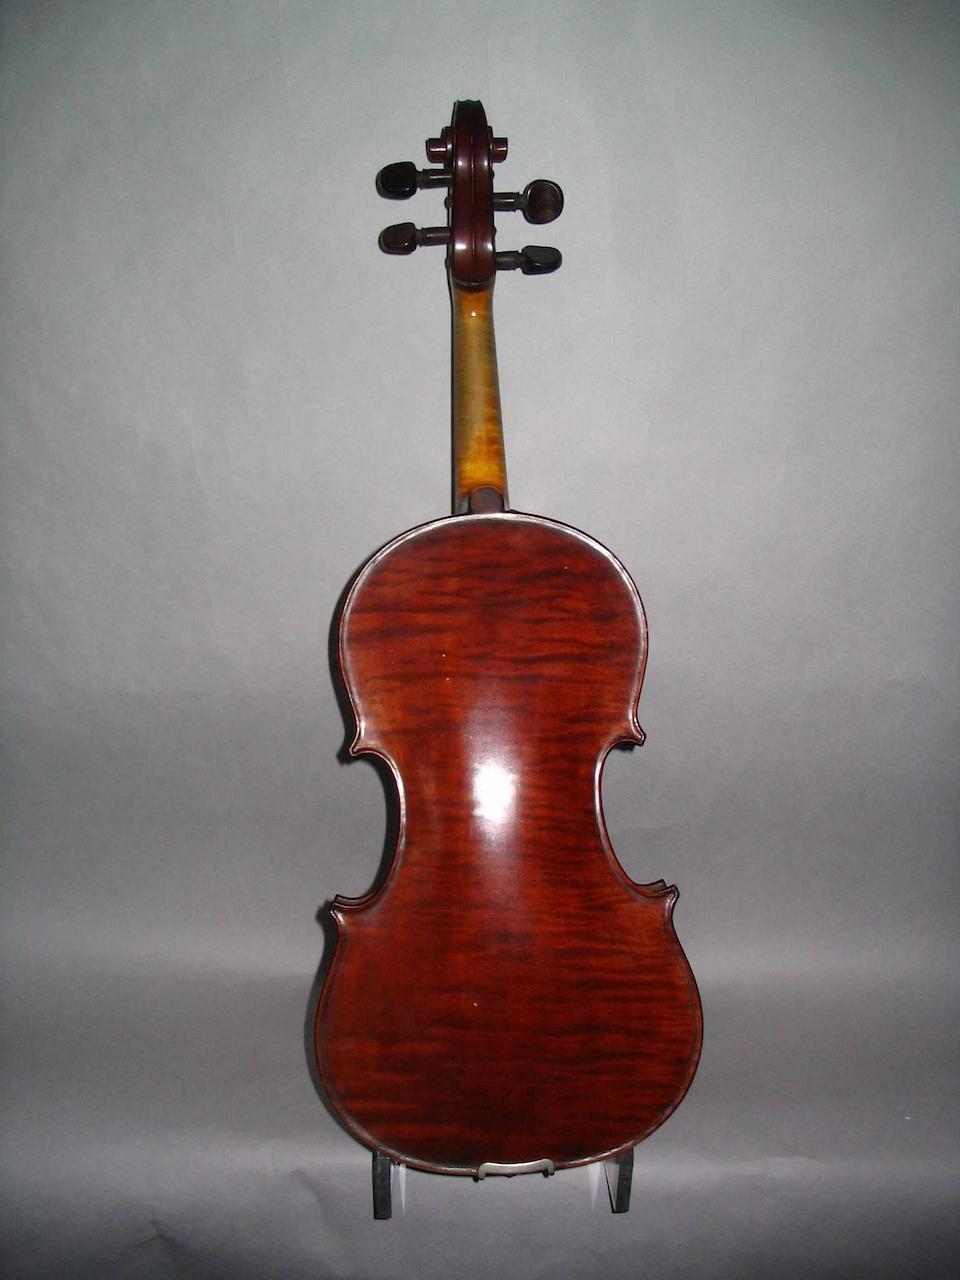 A James Steele Violin 1921